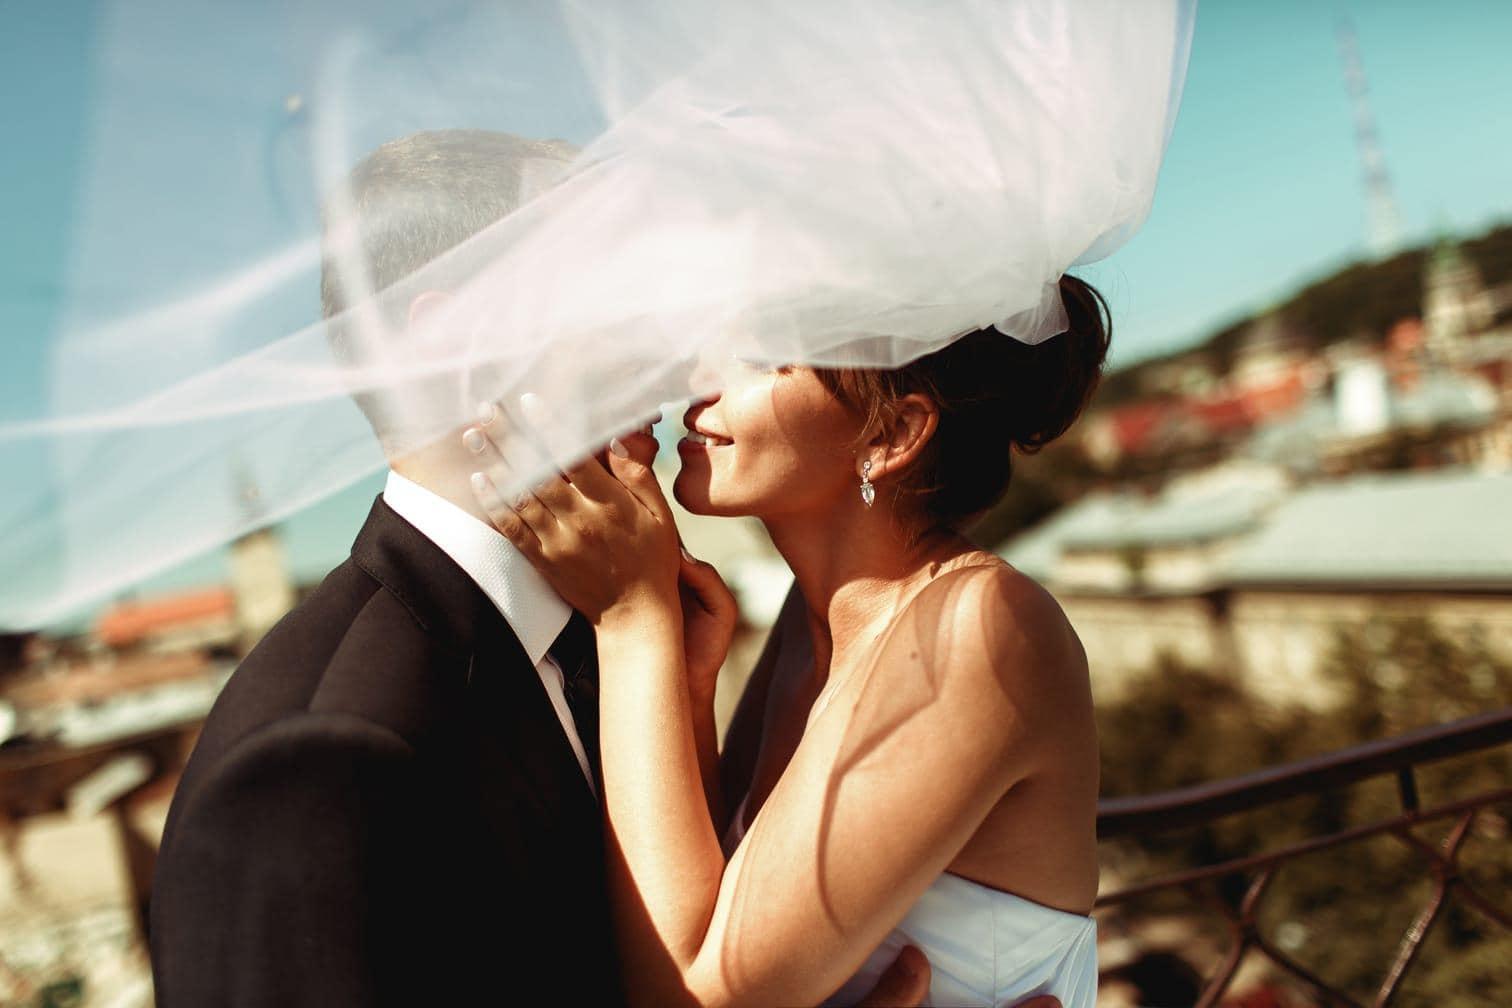 Foto: Shutterstock/IVASHstudio